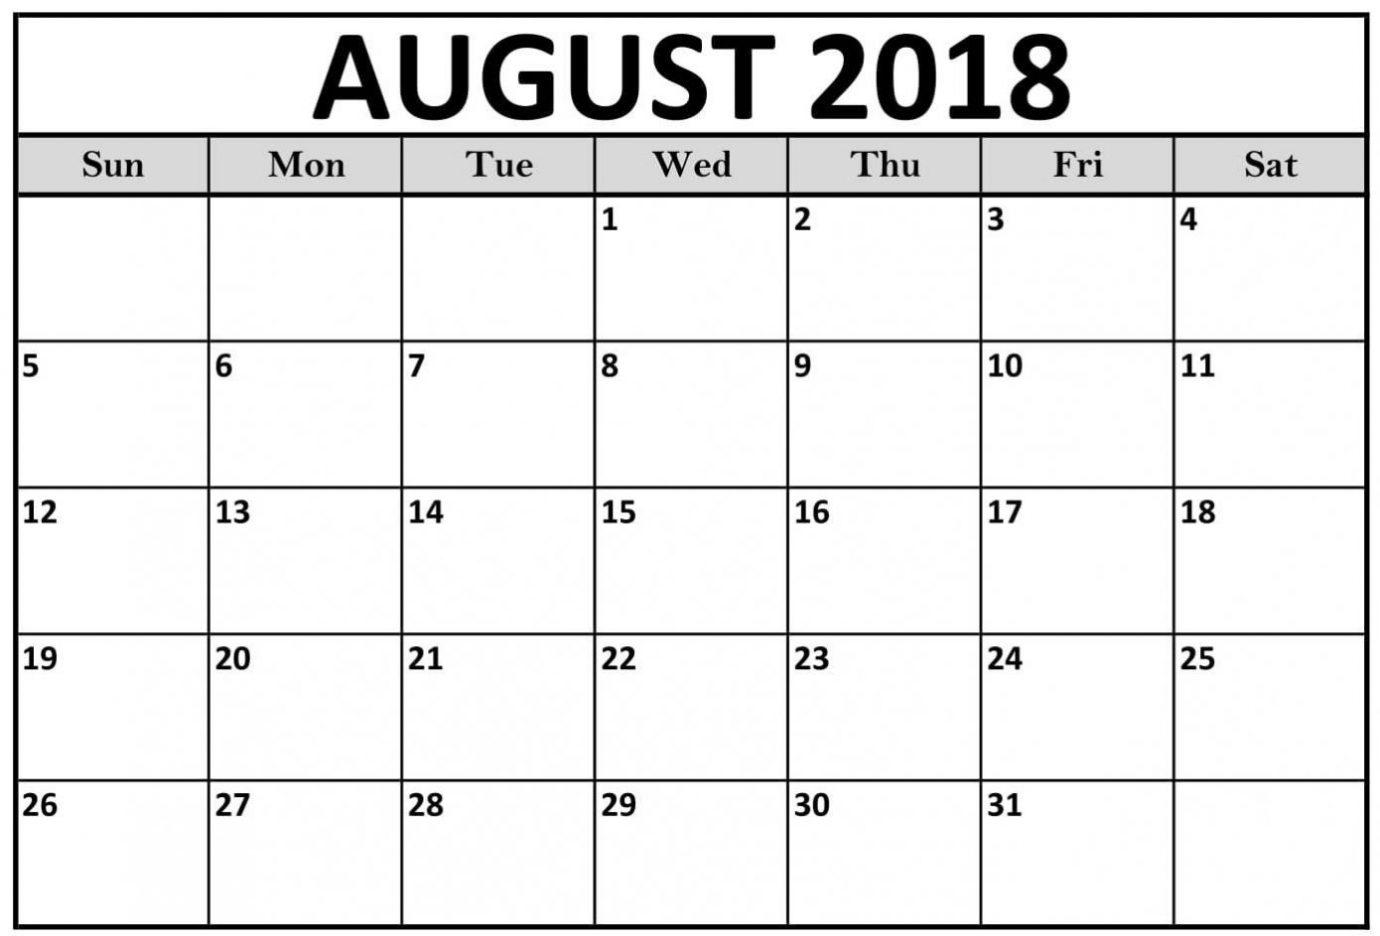 online blank calendar august 2018 printable 2018 calendar Blank Calendar Of August 2018 Full Page erdferdf